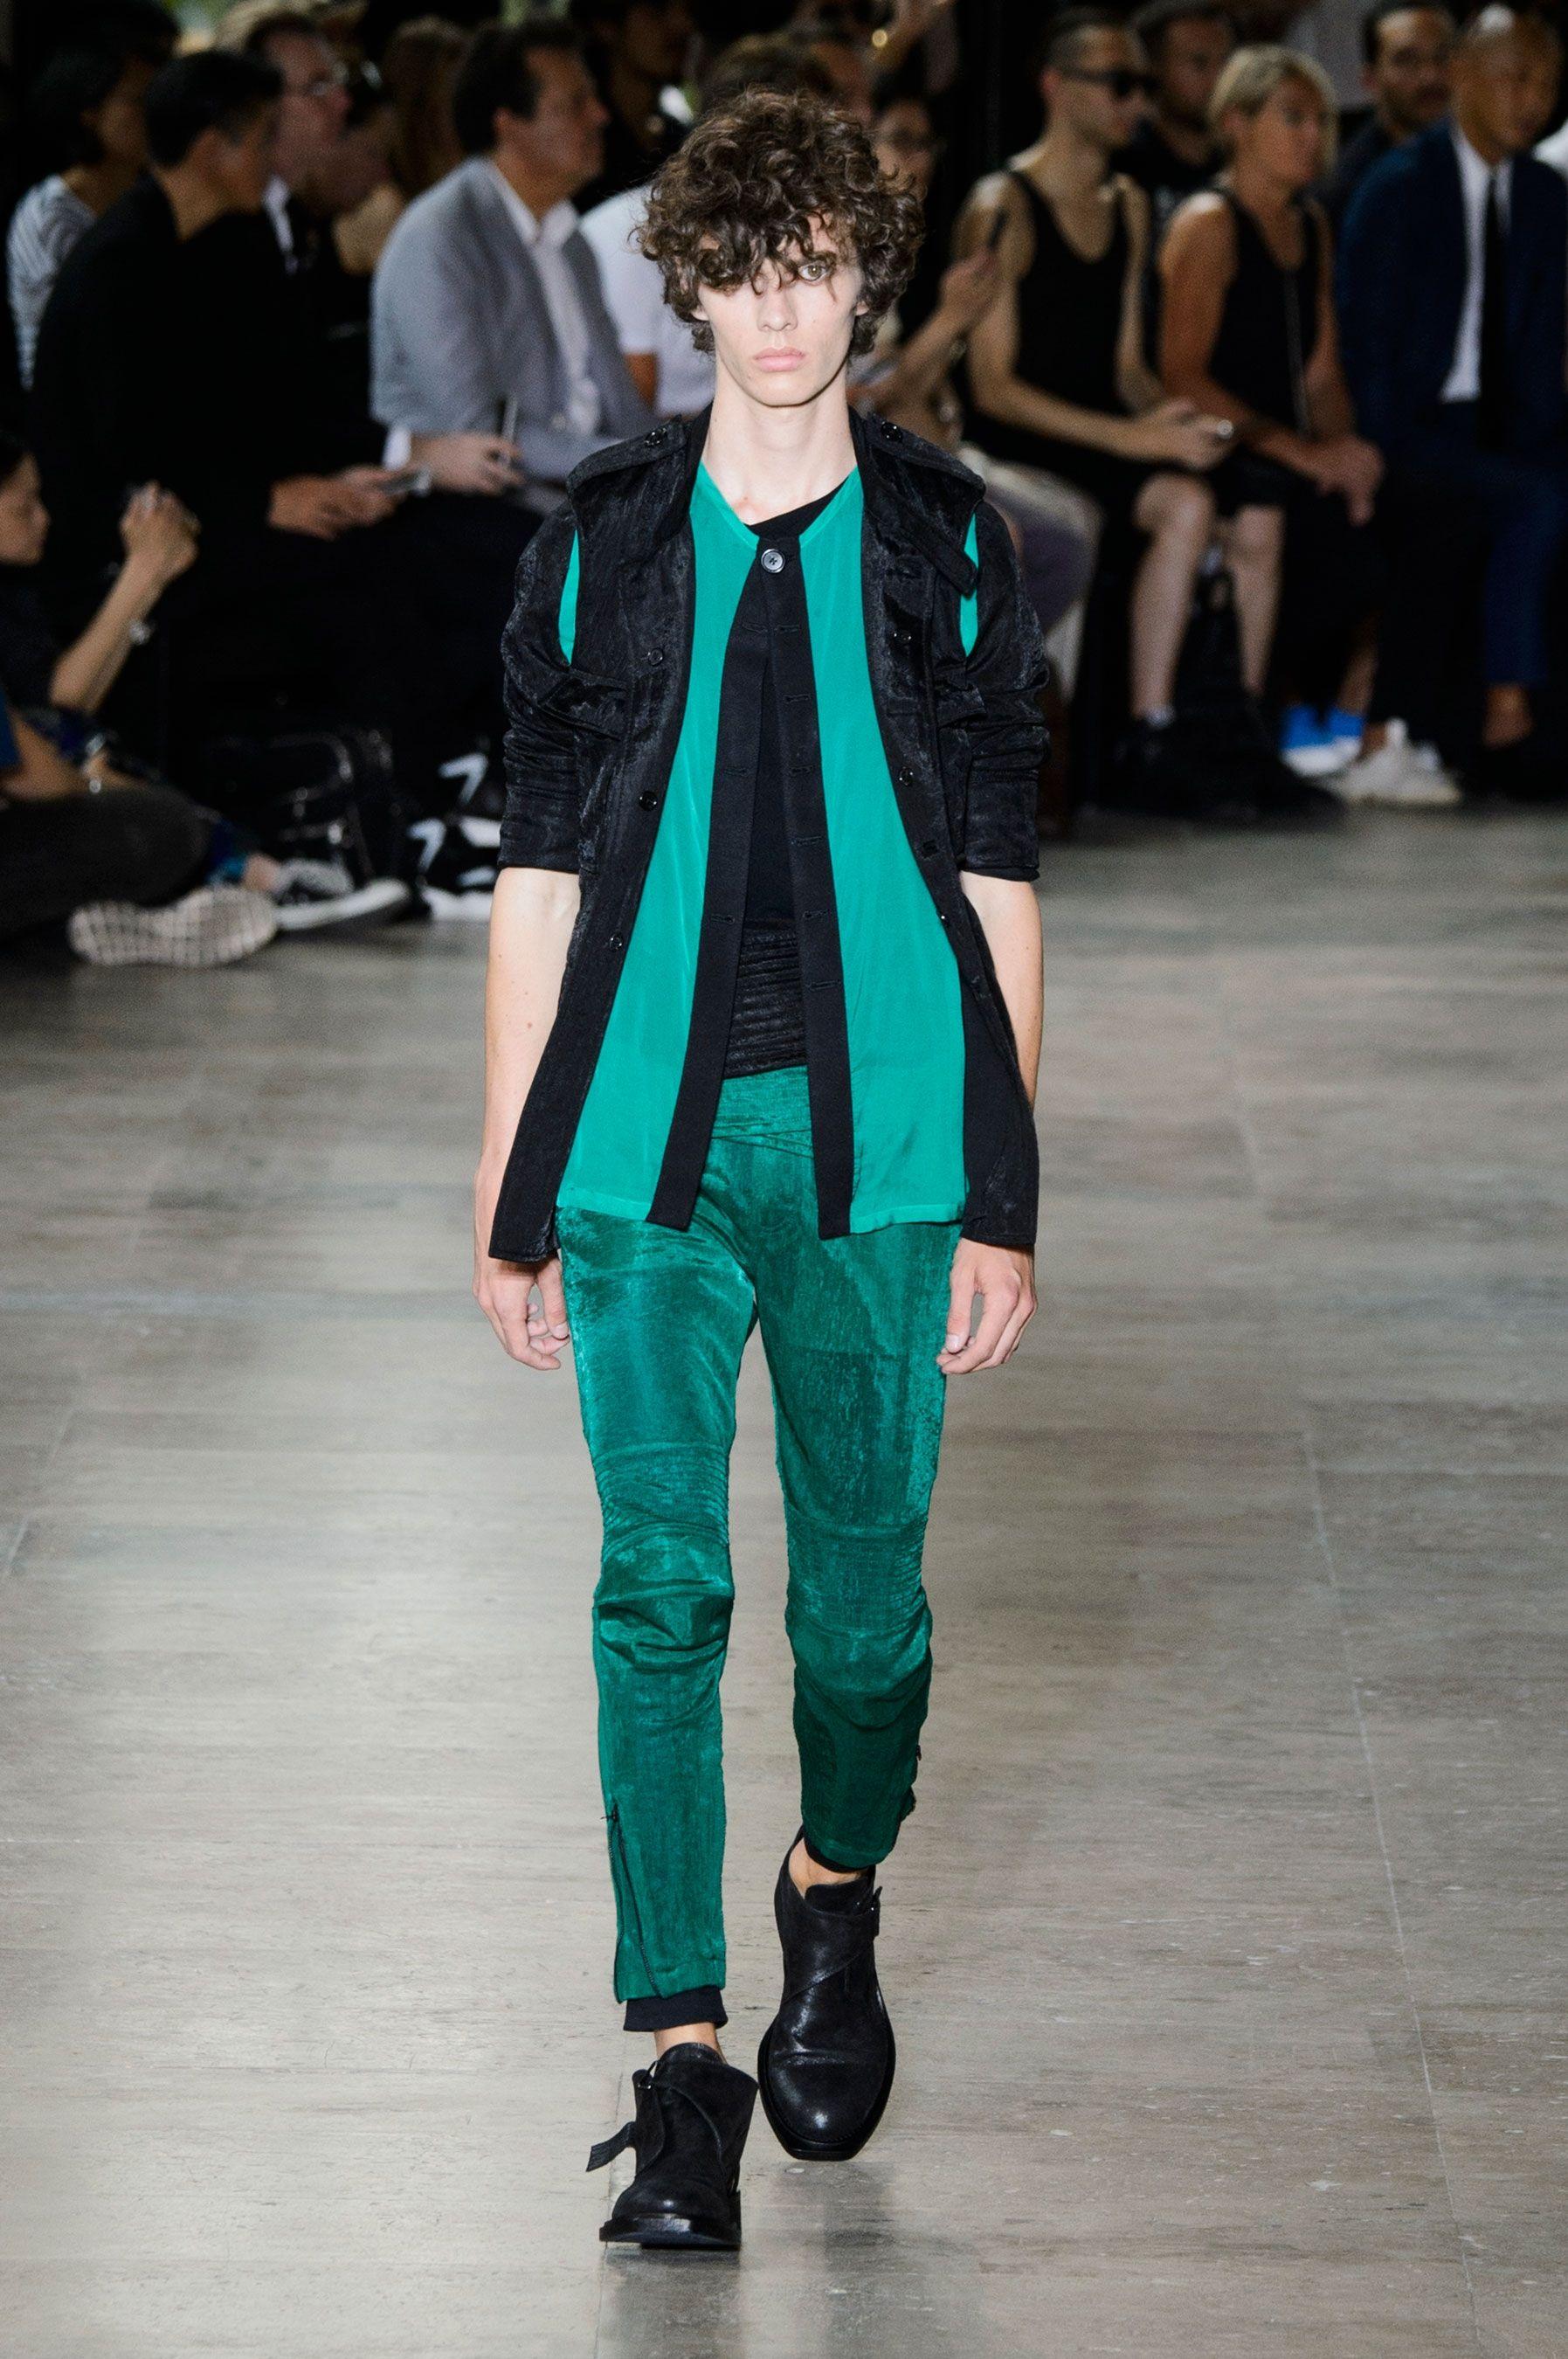 Ann Demeulemeester SpringSummer 2016 Collection - Paris Fashion Week - DerriusPierreCom (16)